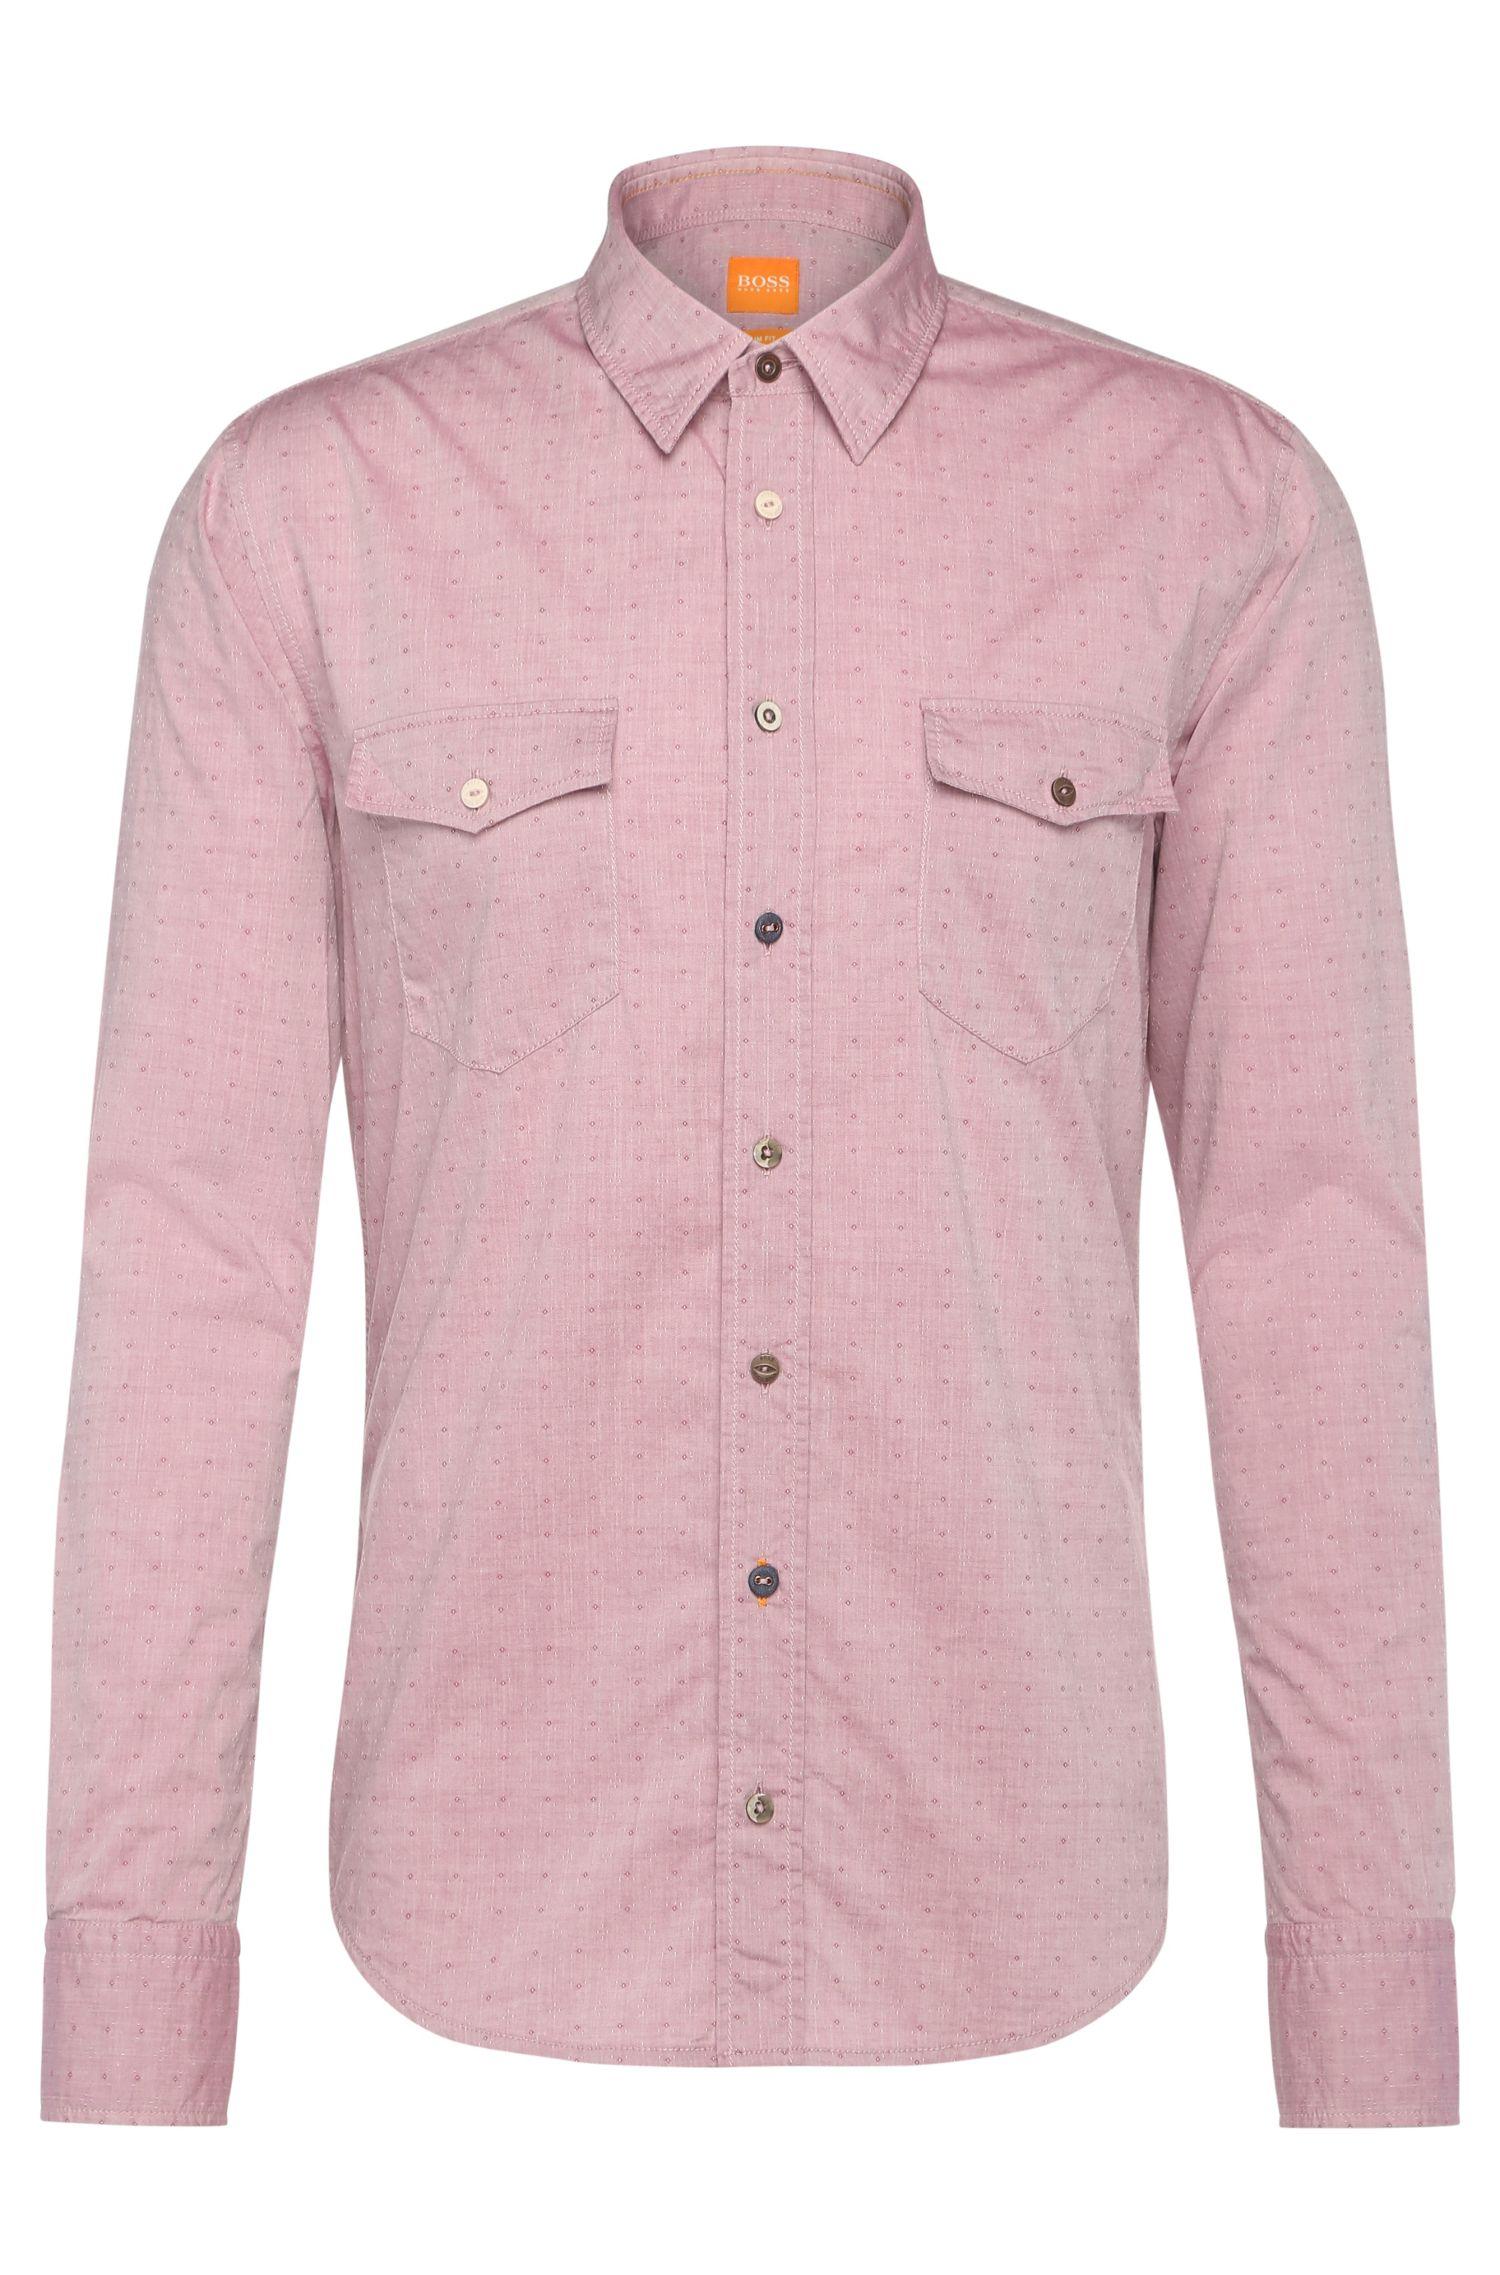 'EdaslimE'   Slim Fit, Cotton Button Down Shirt